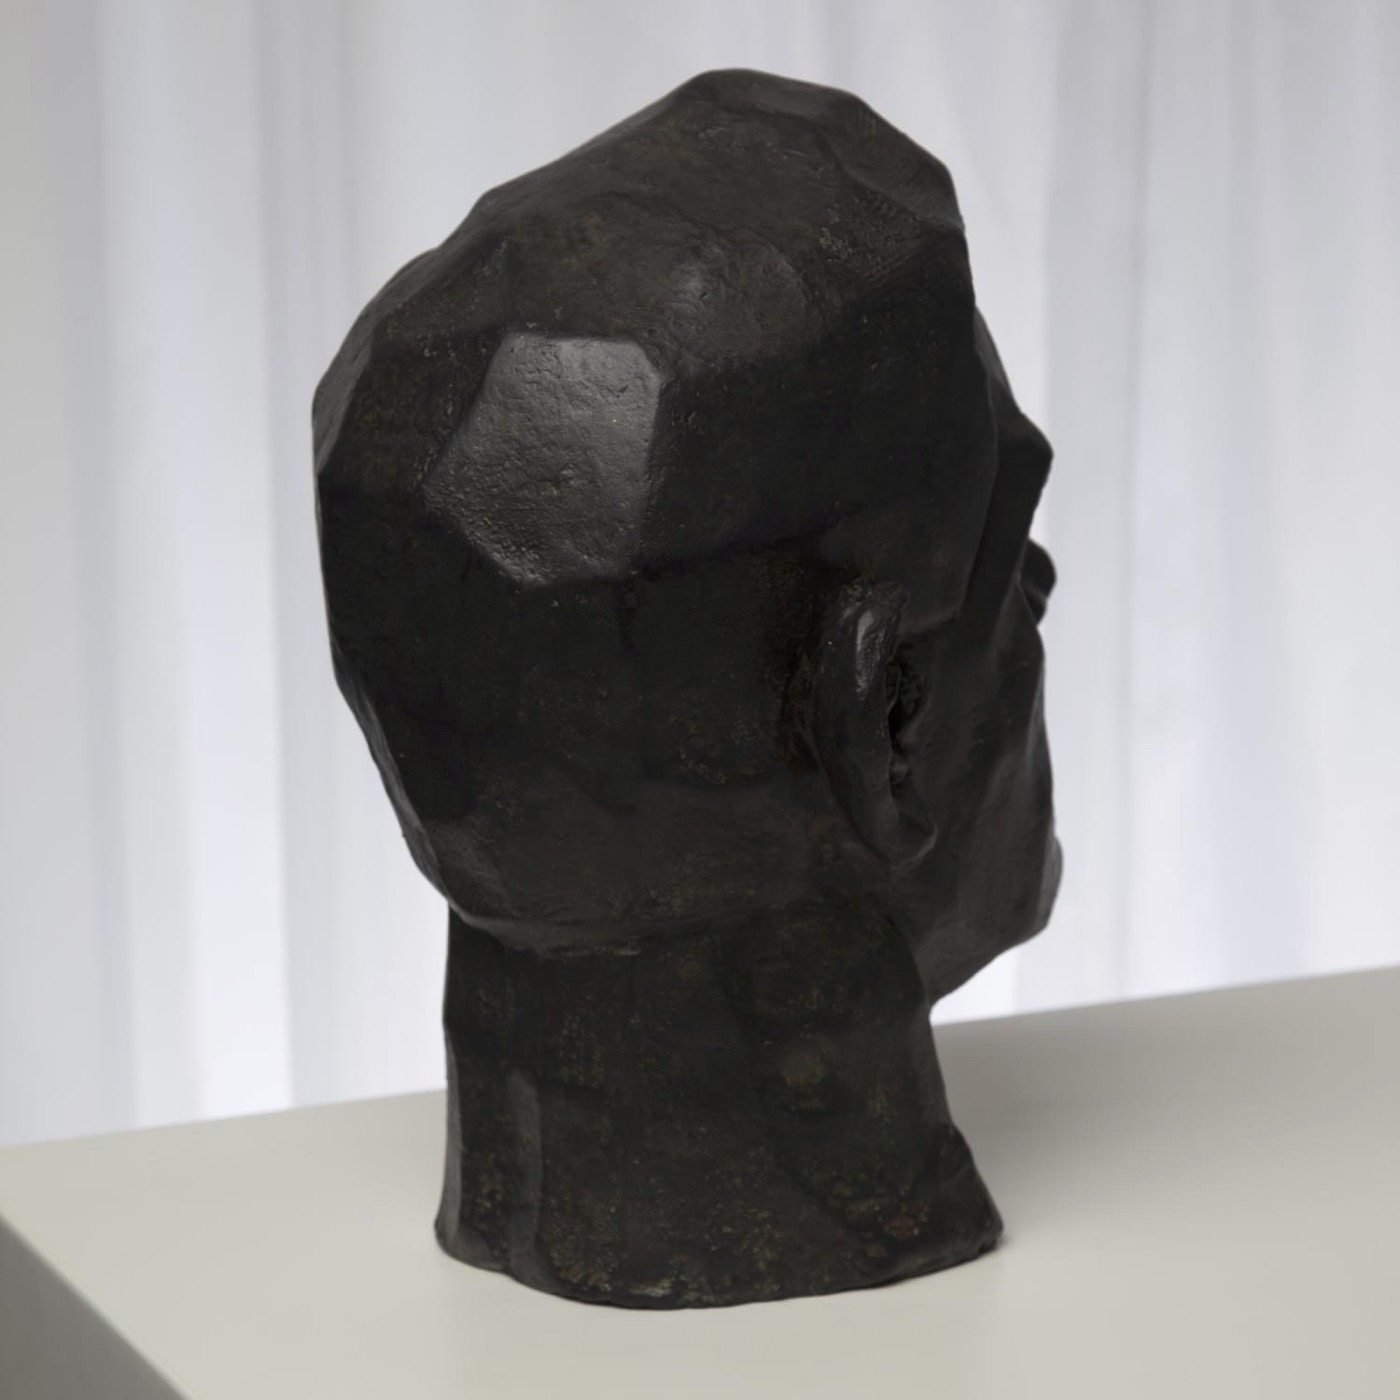 Homme Bronze Sculpture | Chiseled